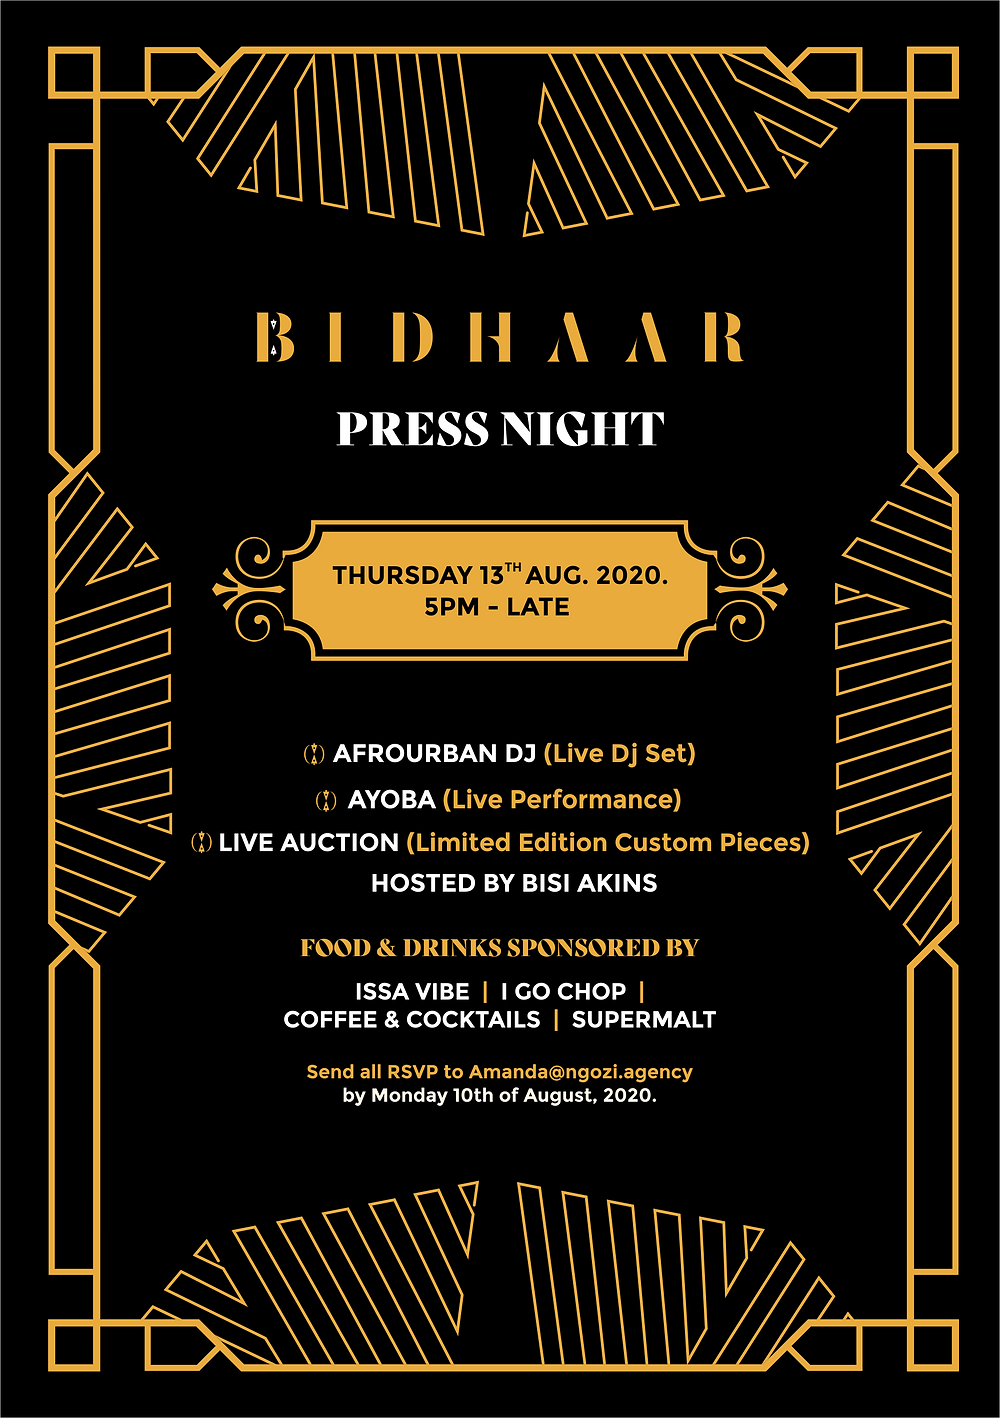 bidhaar_press_night_influencers_fashion_culture